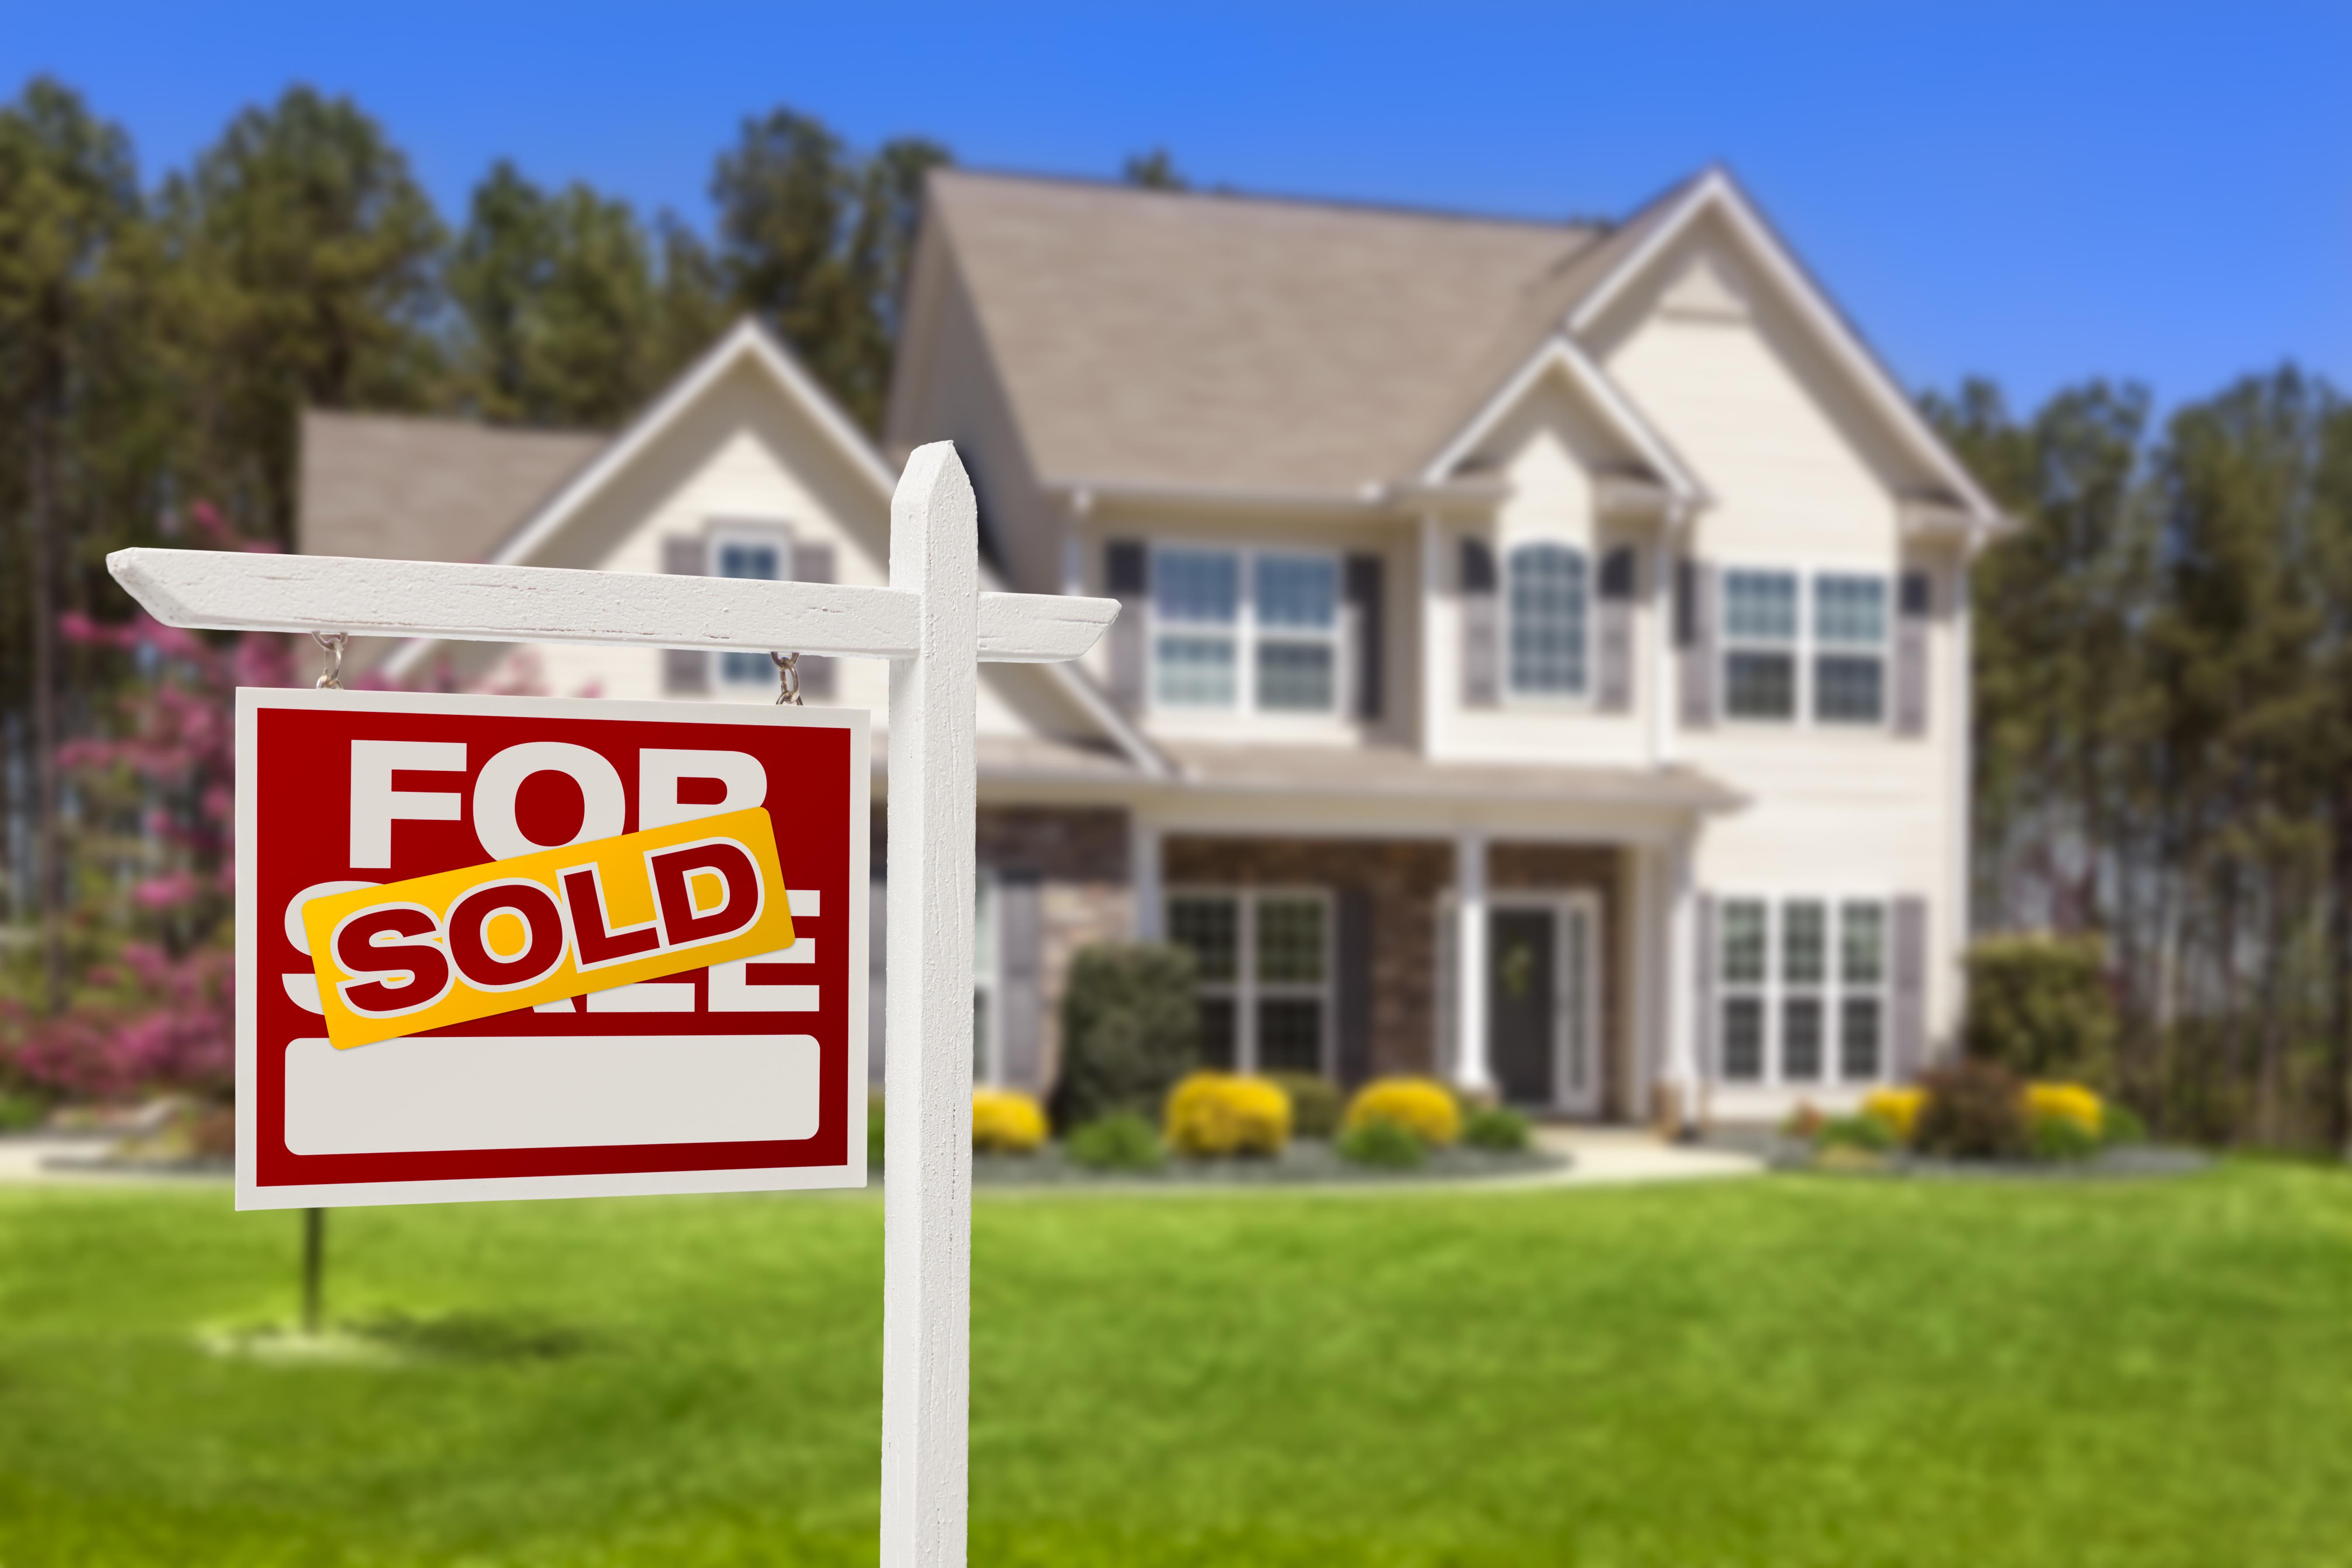 Homes For Sale in Bountiful, Utah